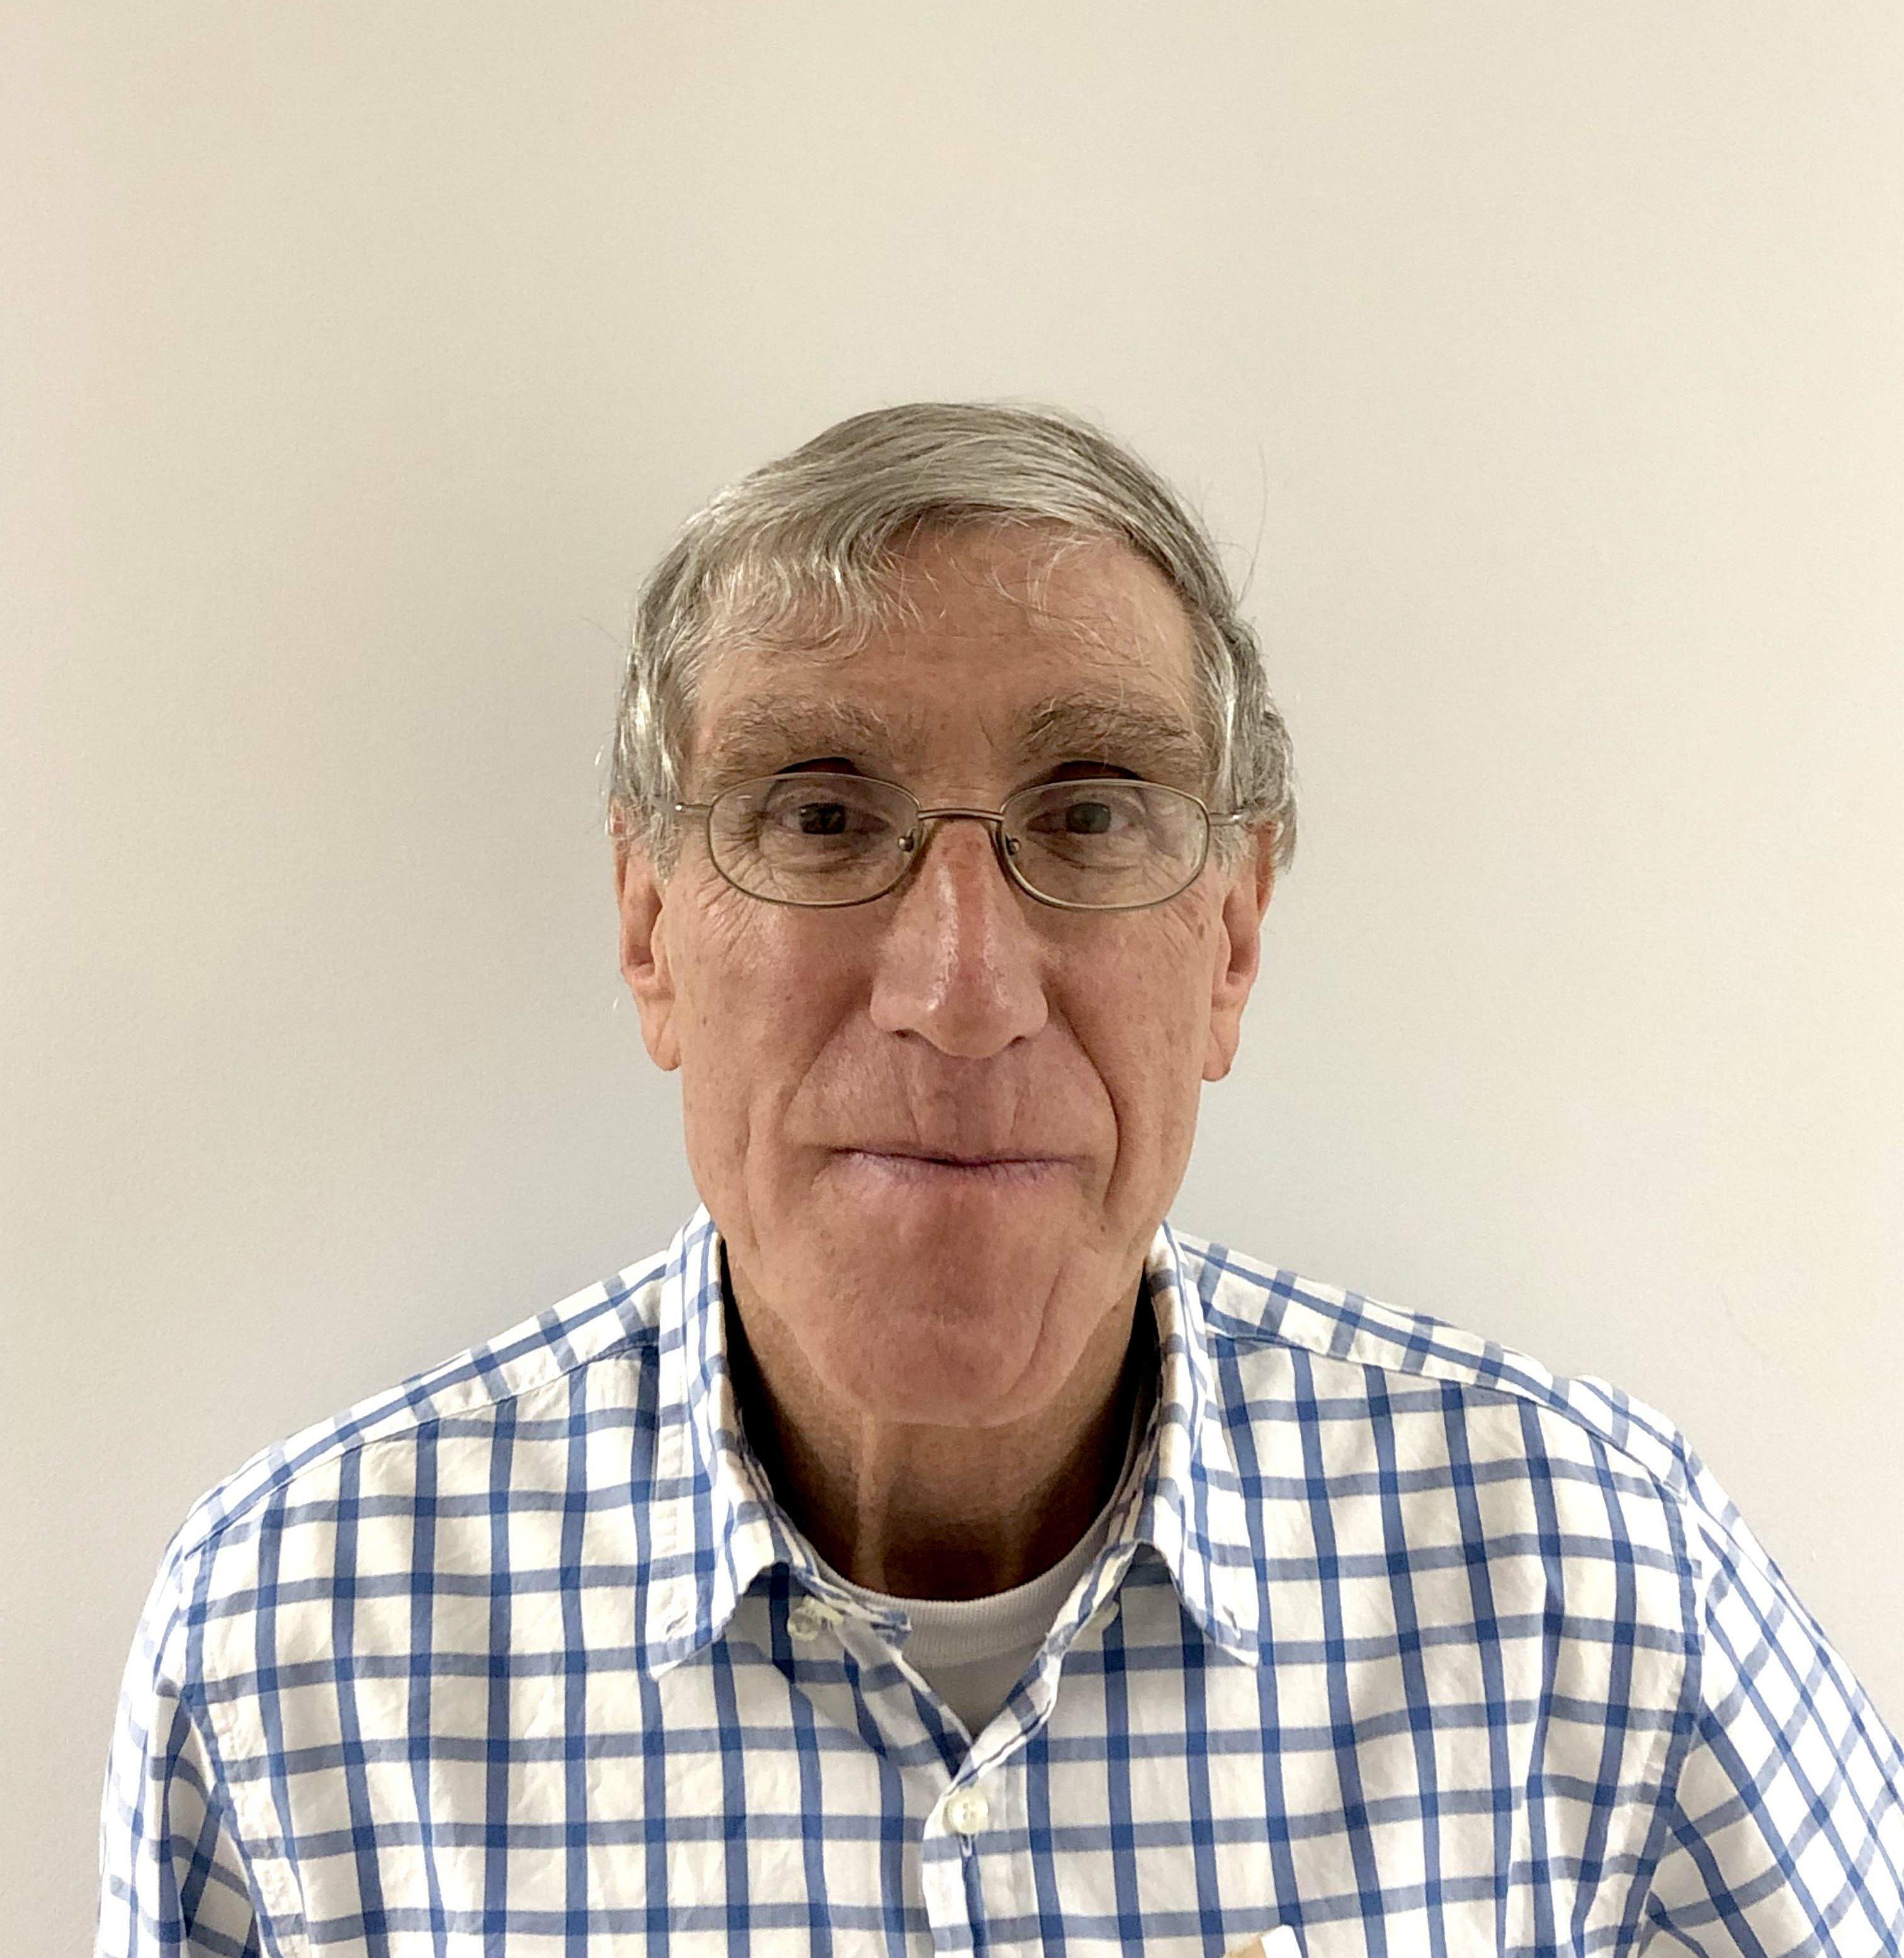 Dr. Eliot Cohen, O.D - Director of Eye Care